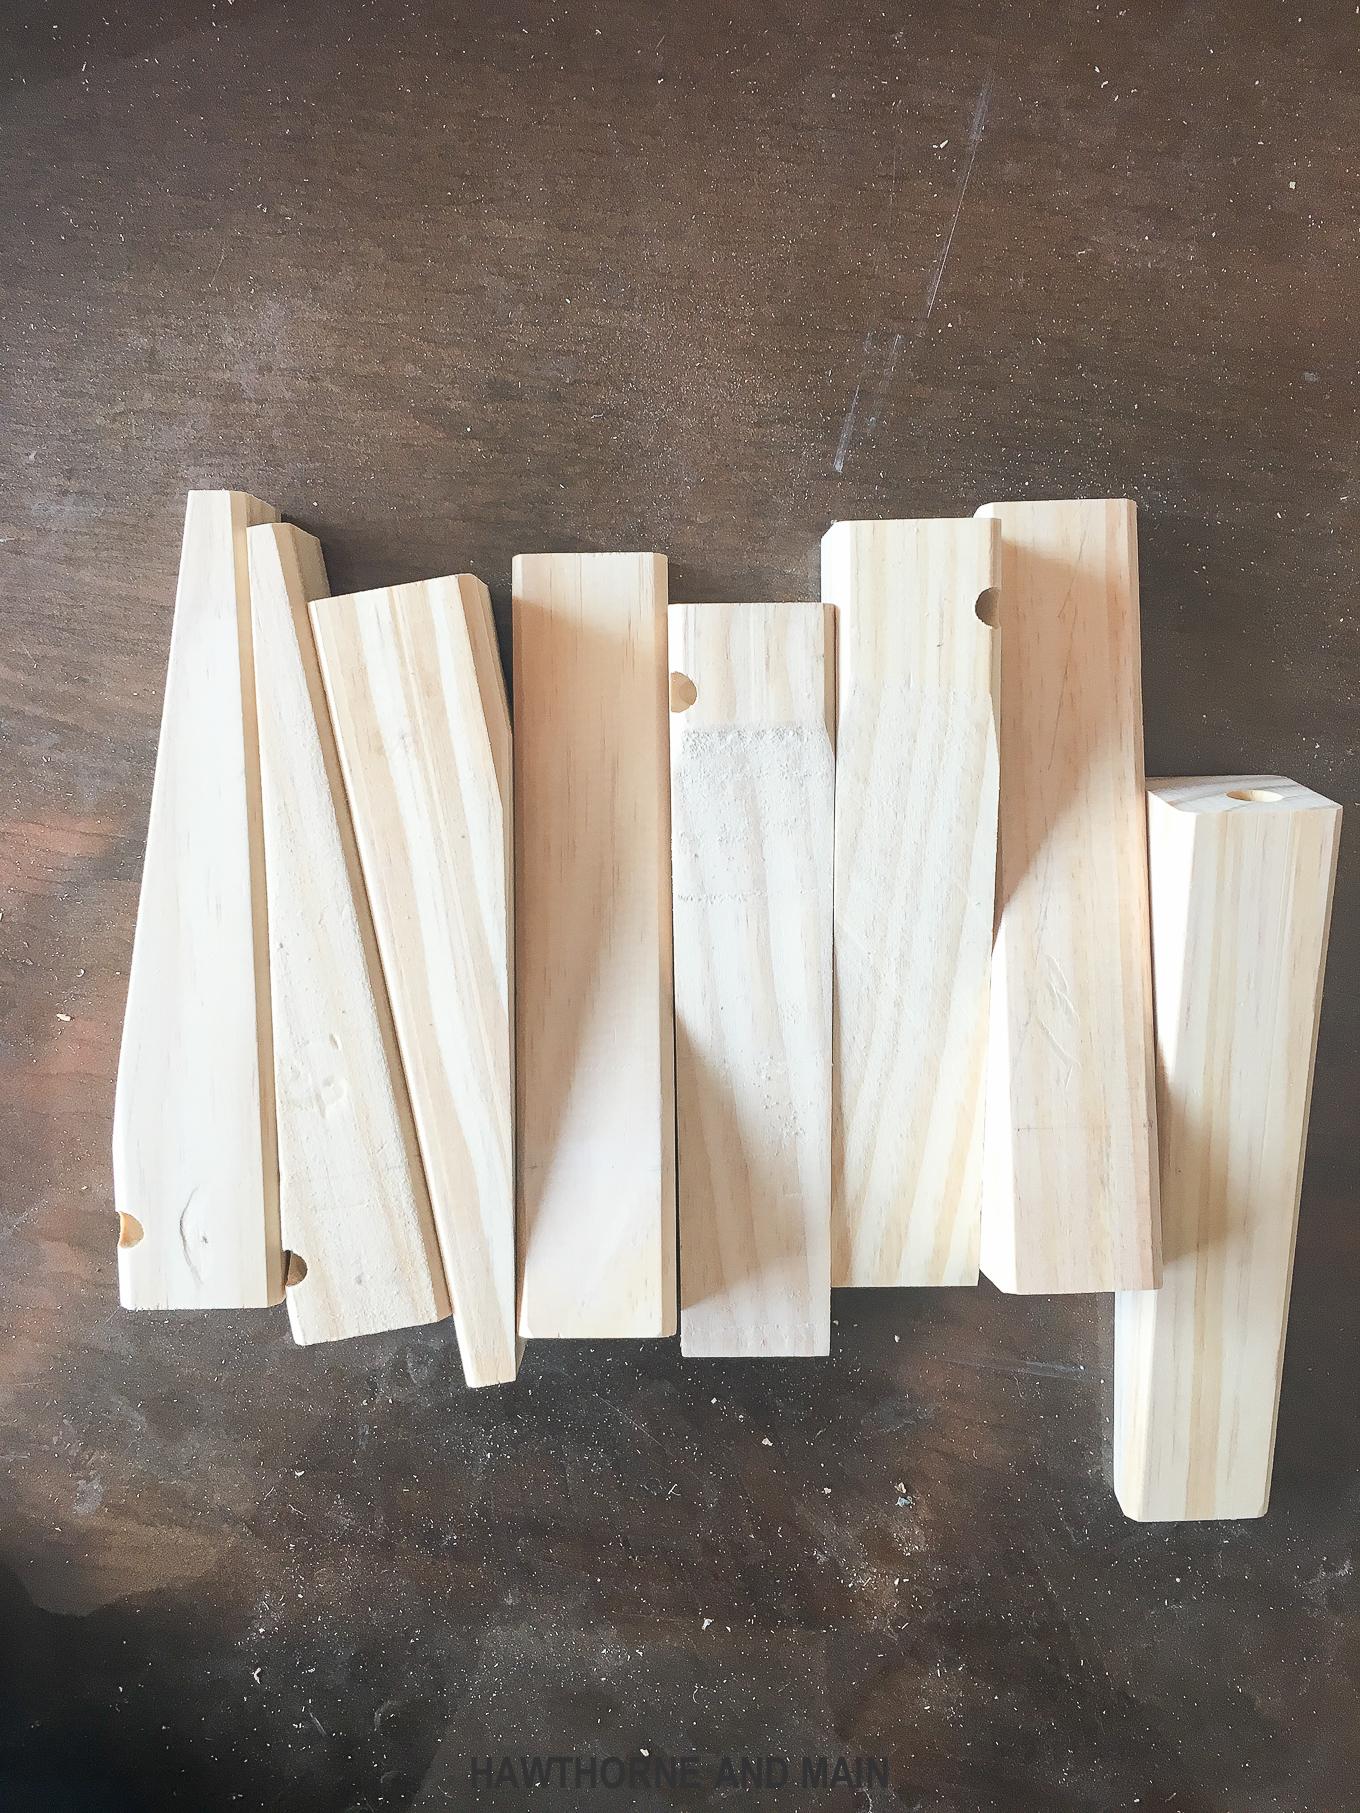 cut-legs-for-tarva-hack